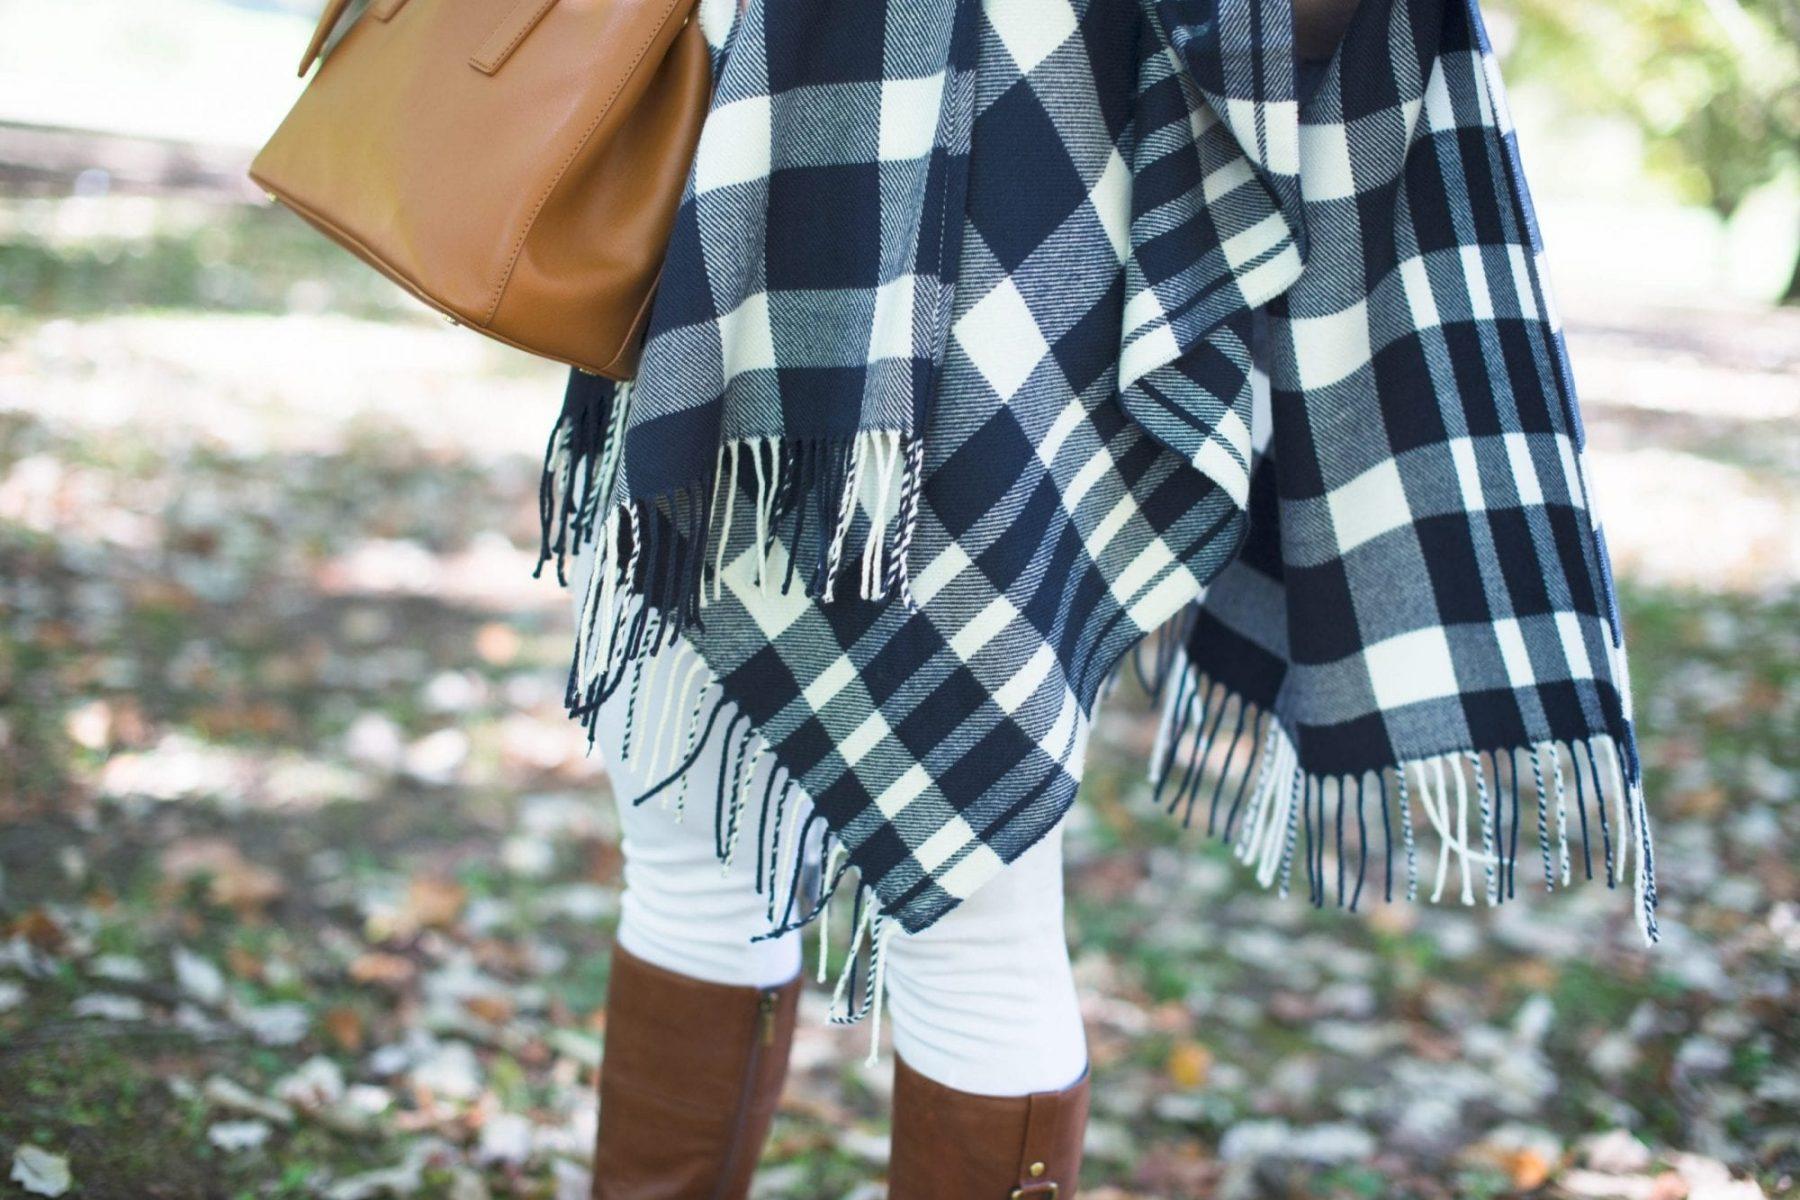 Blanket Cape-Fall Fashion-Winter -Cozy-Plaid-J.Crew Sweater1